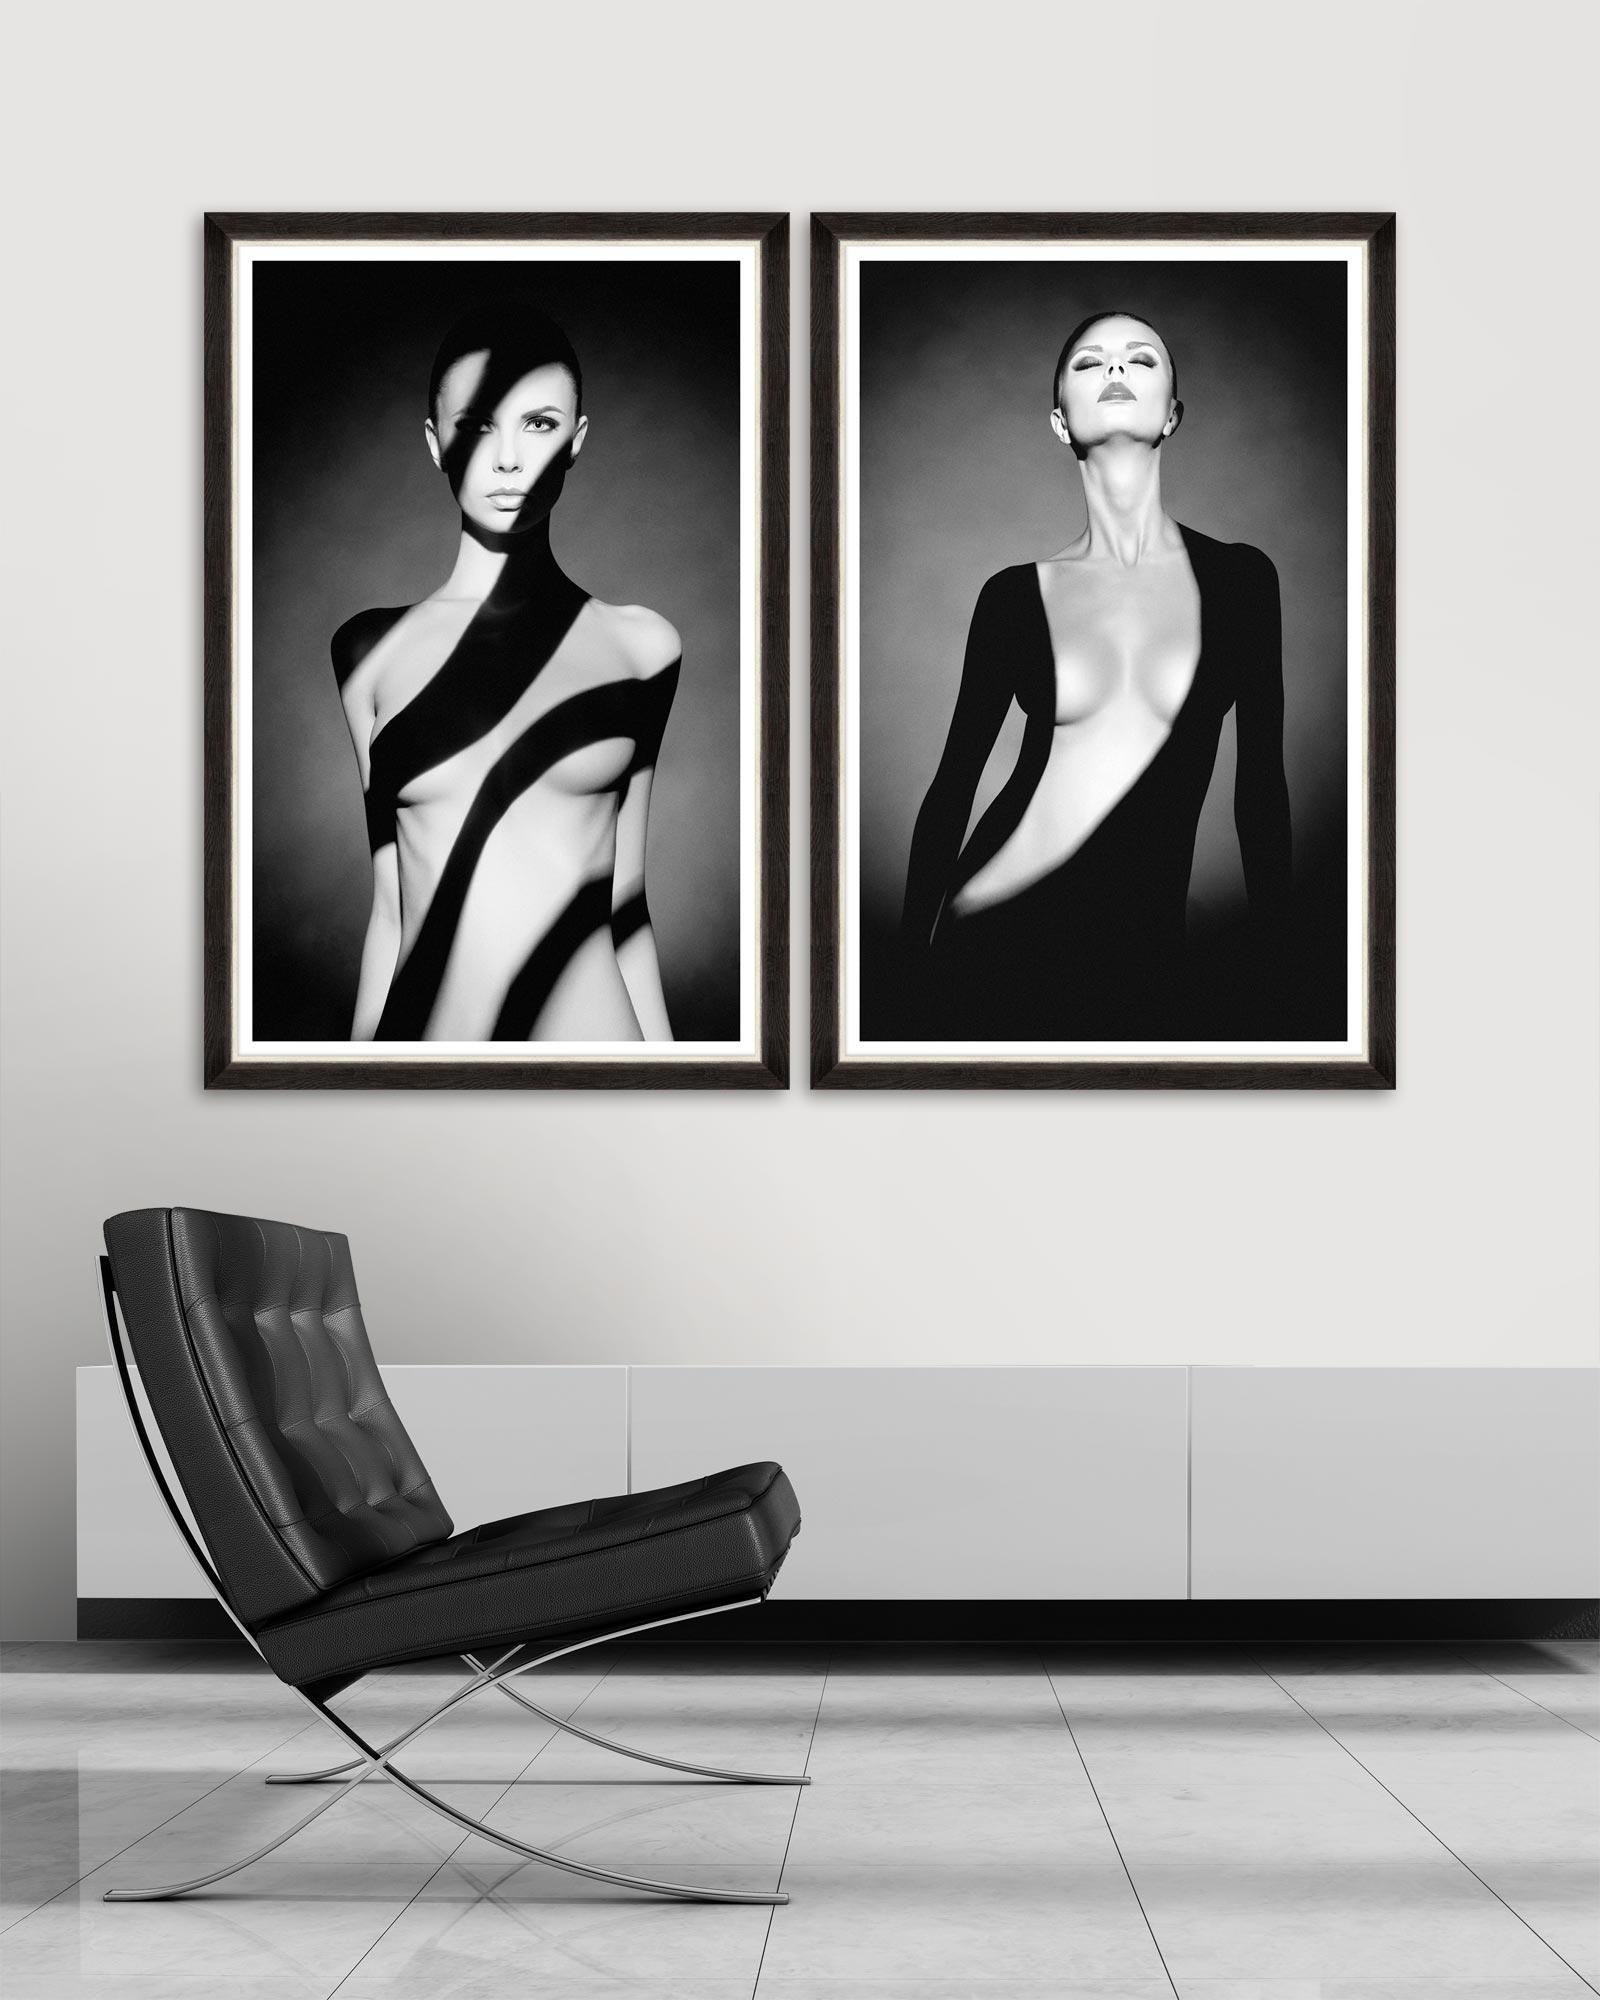 Tablou 2 piese Framed Art Body Shadows imagine